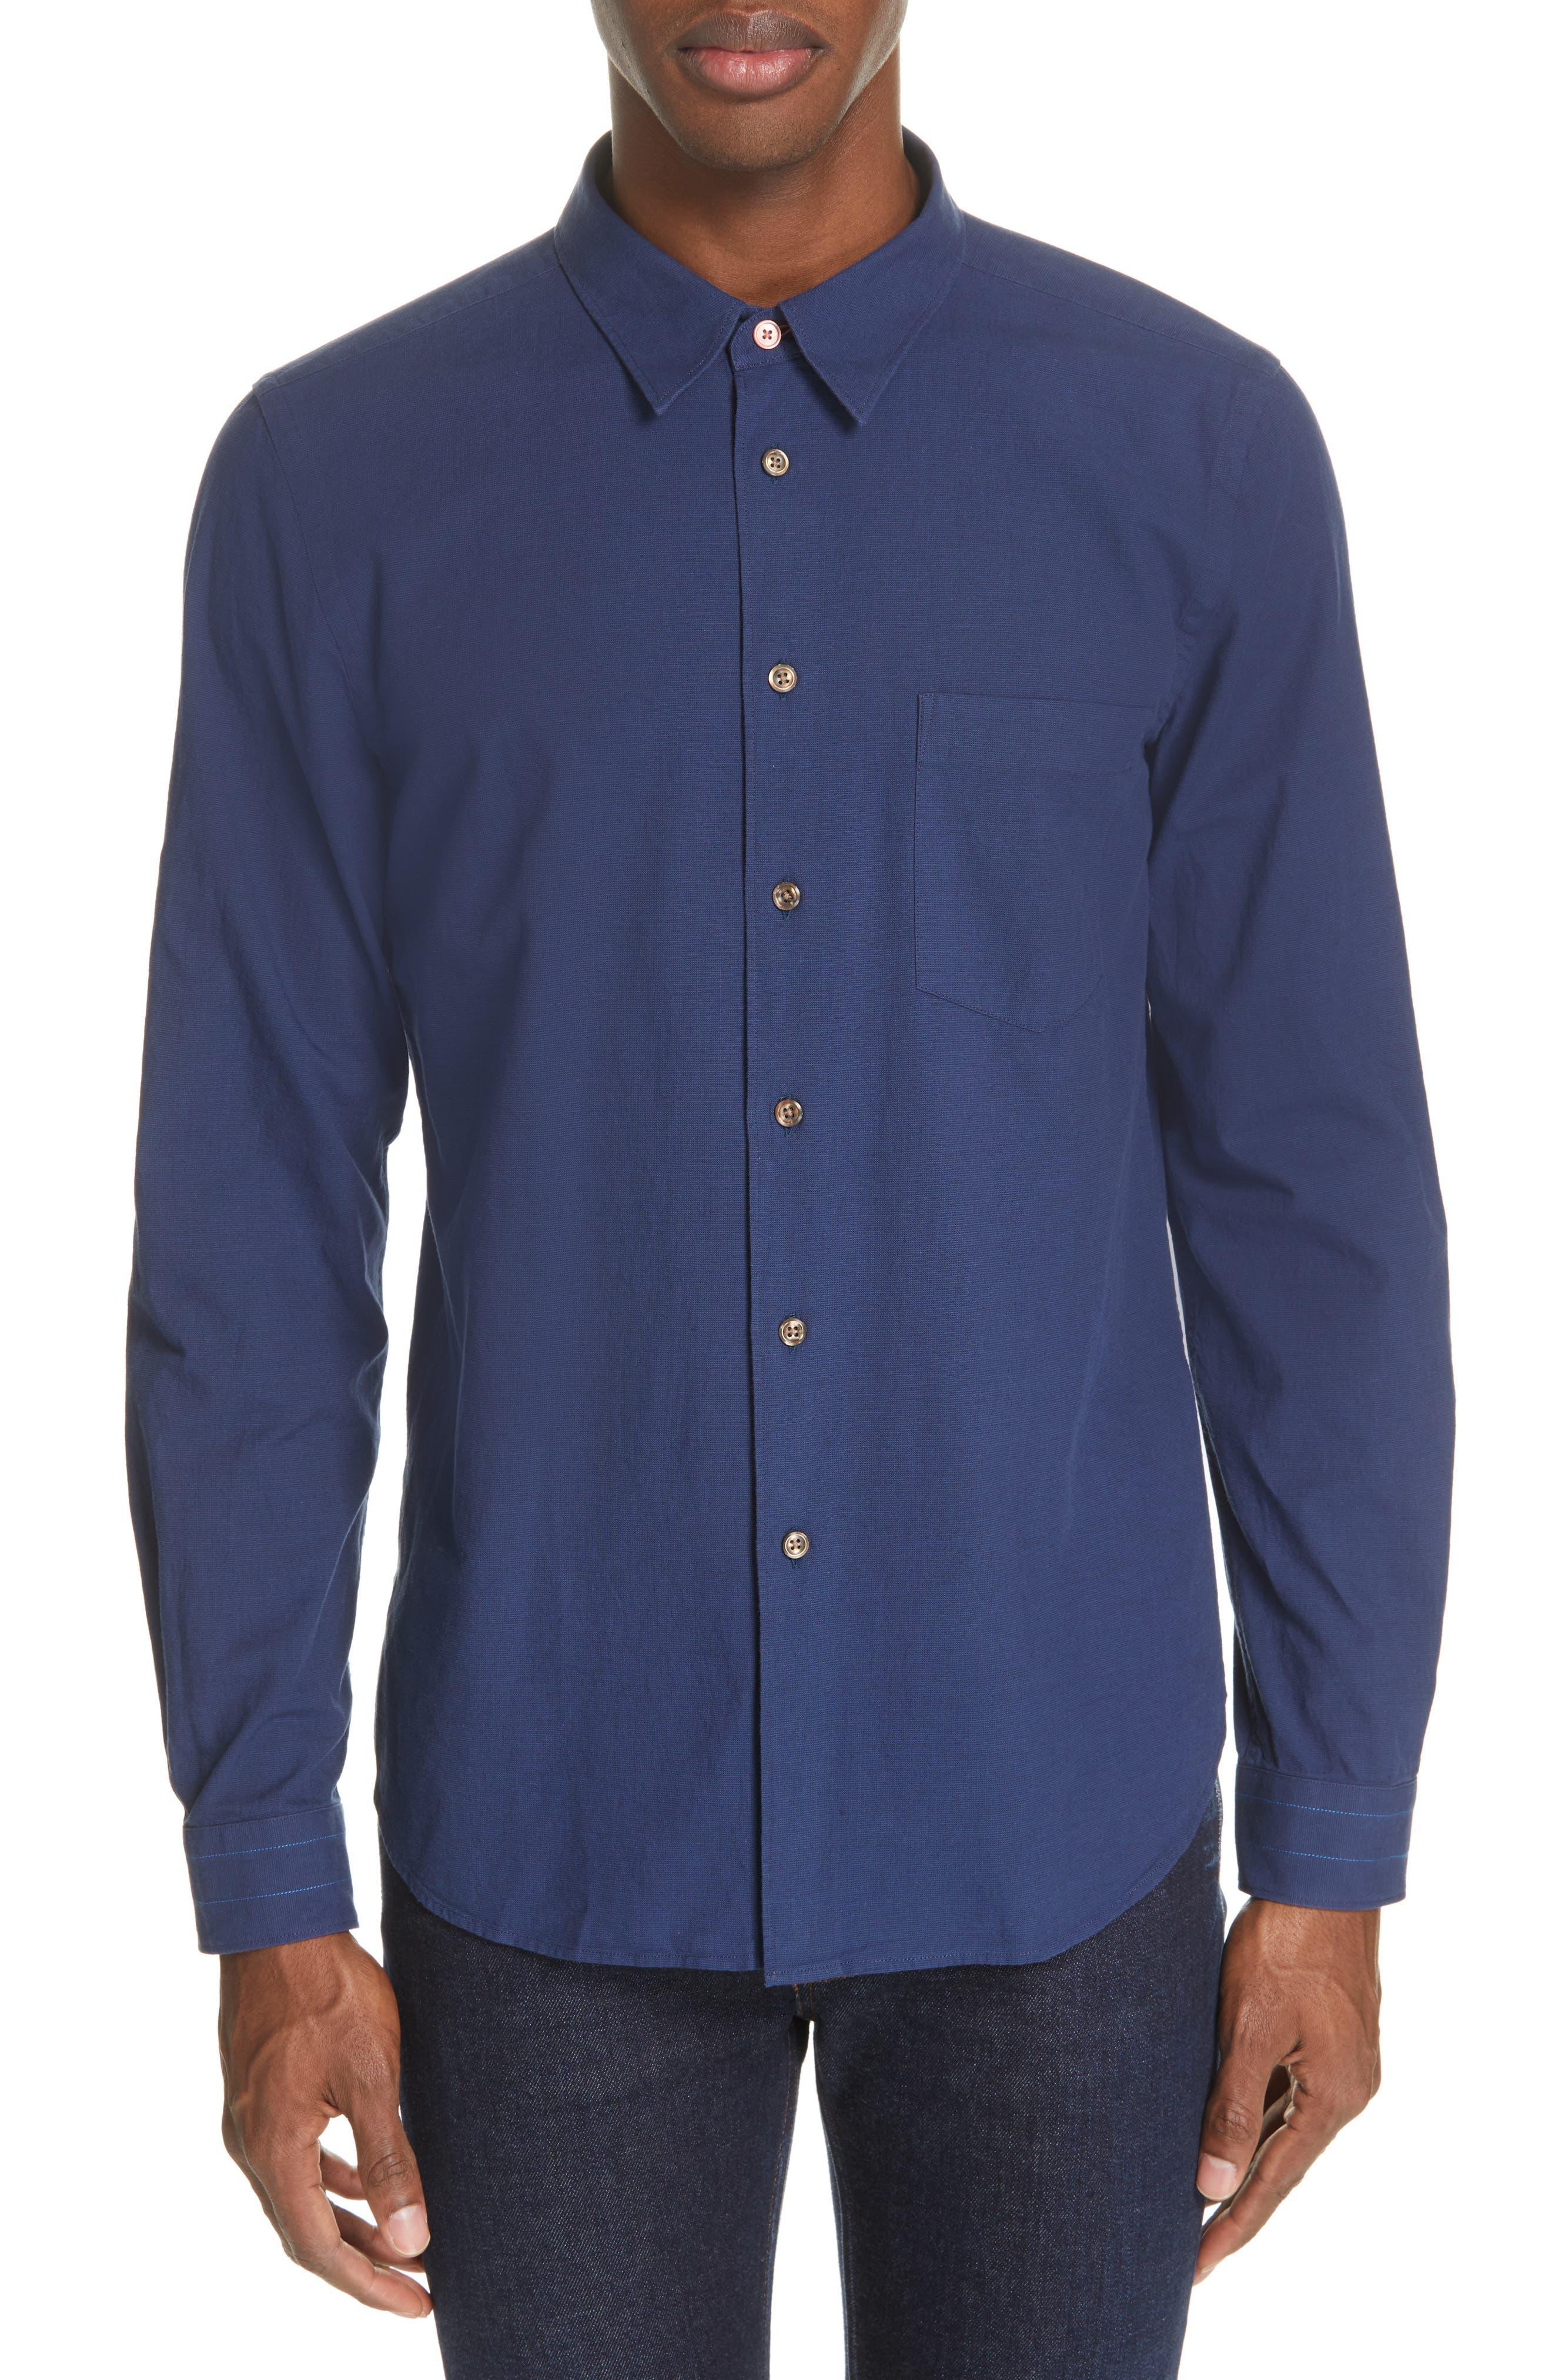 PS PAUL SMITH, Contrast Sport Shirt, Main thumbnail 1, color, BLUE